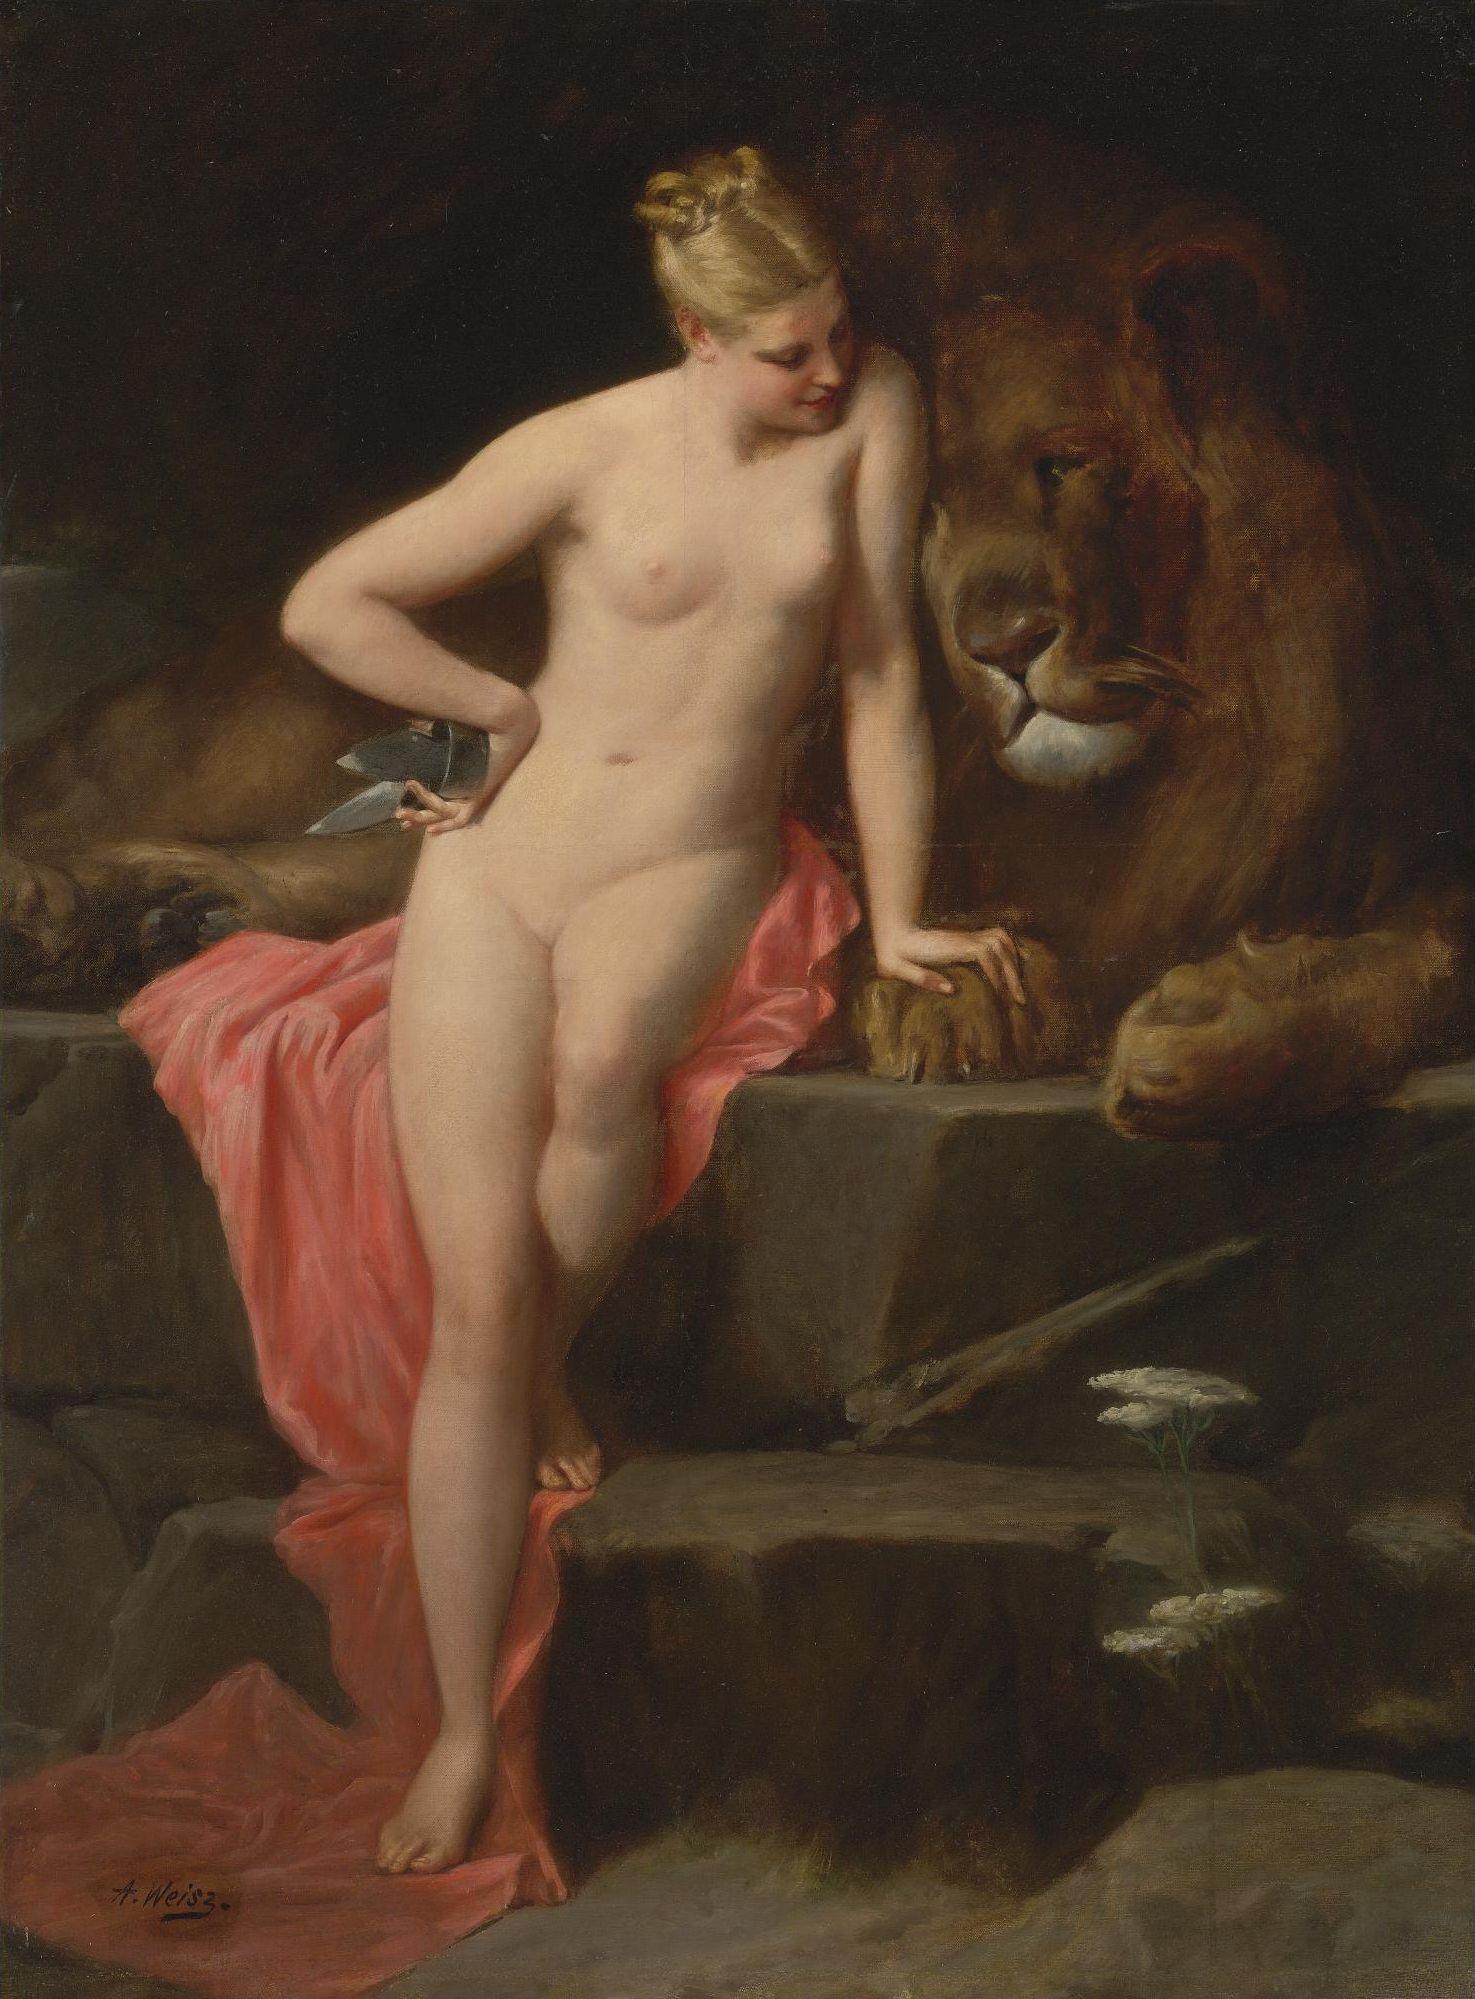 Adolphe Weisz, 1838-1916. Диана и лев. Частная коллекция